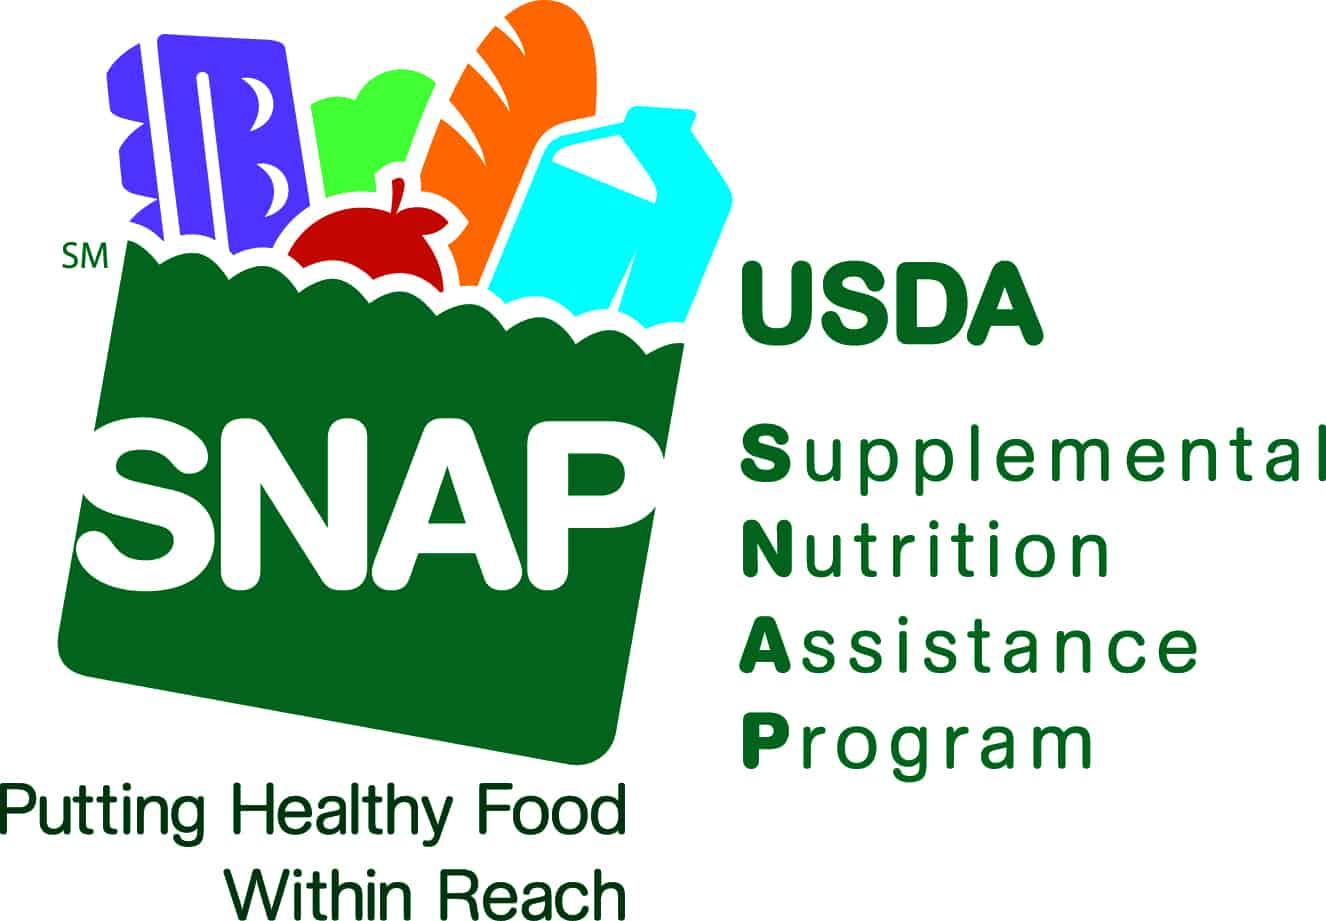 NC Food Assistance Programs - A SNAPshot